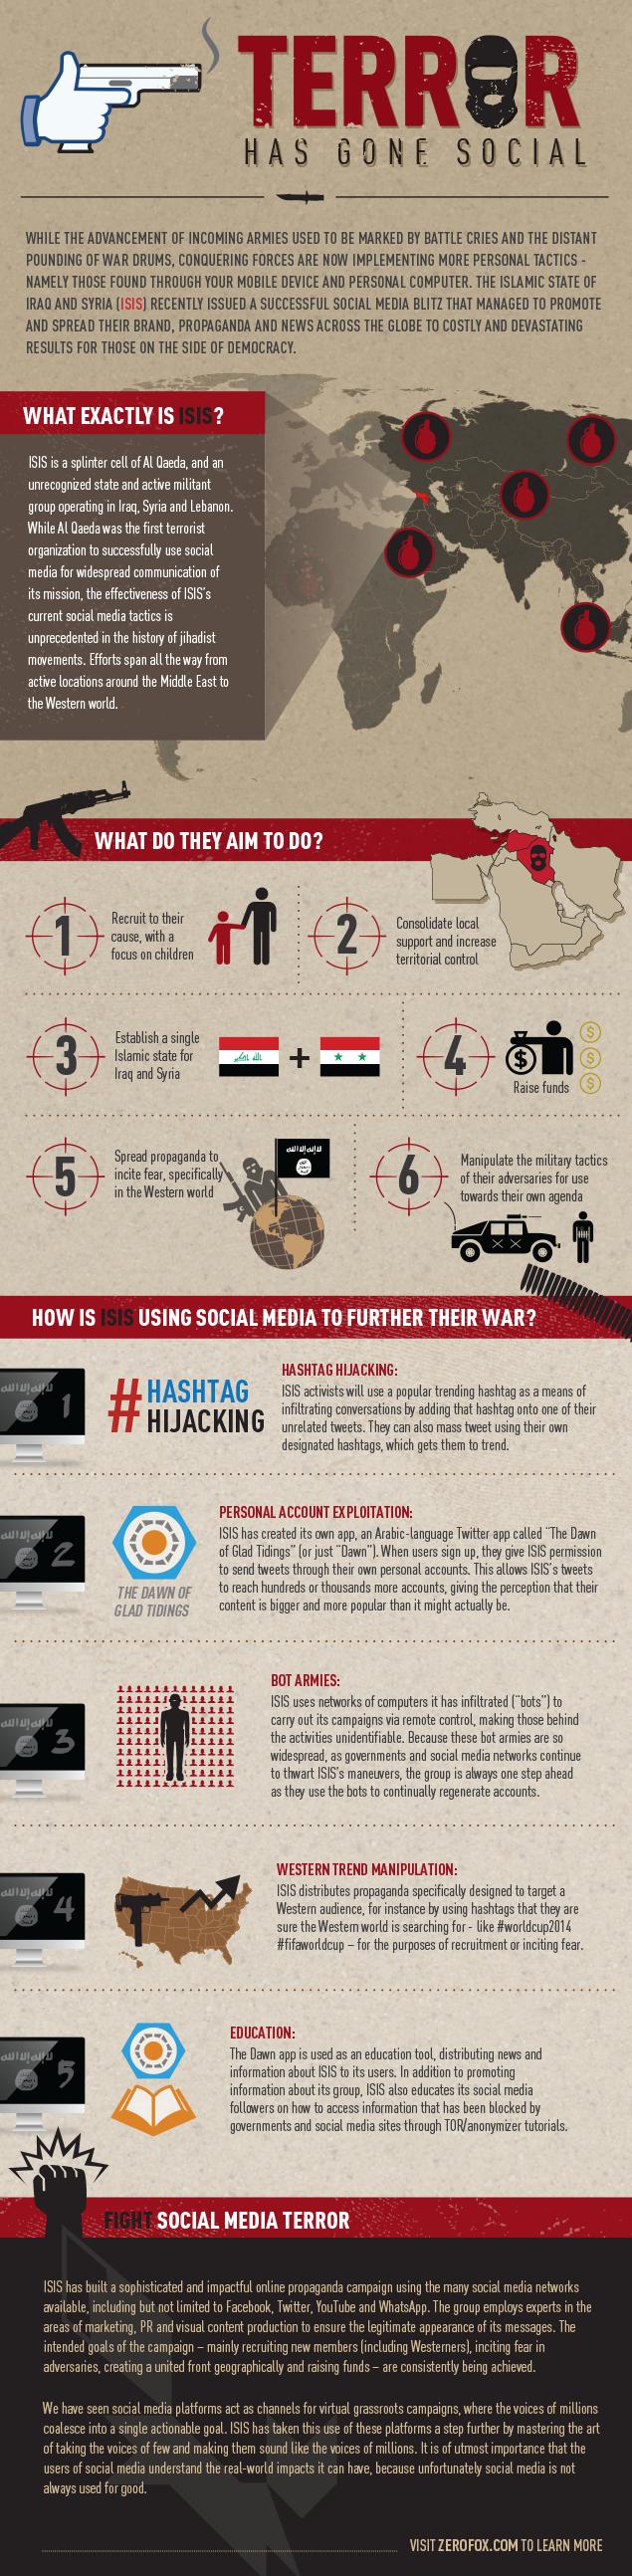 Terror has gone social